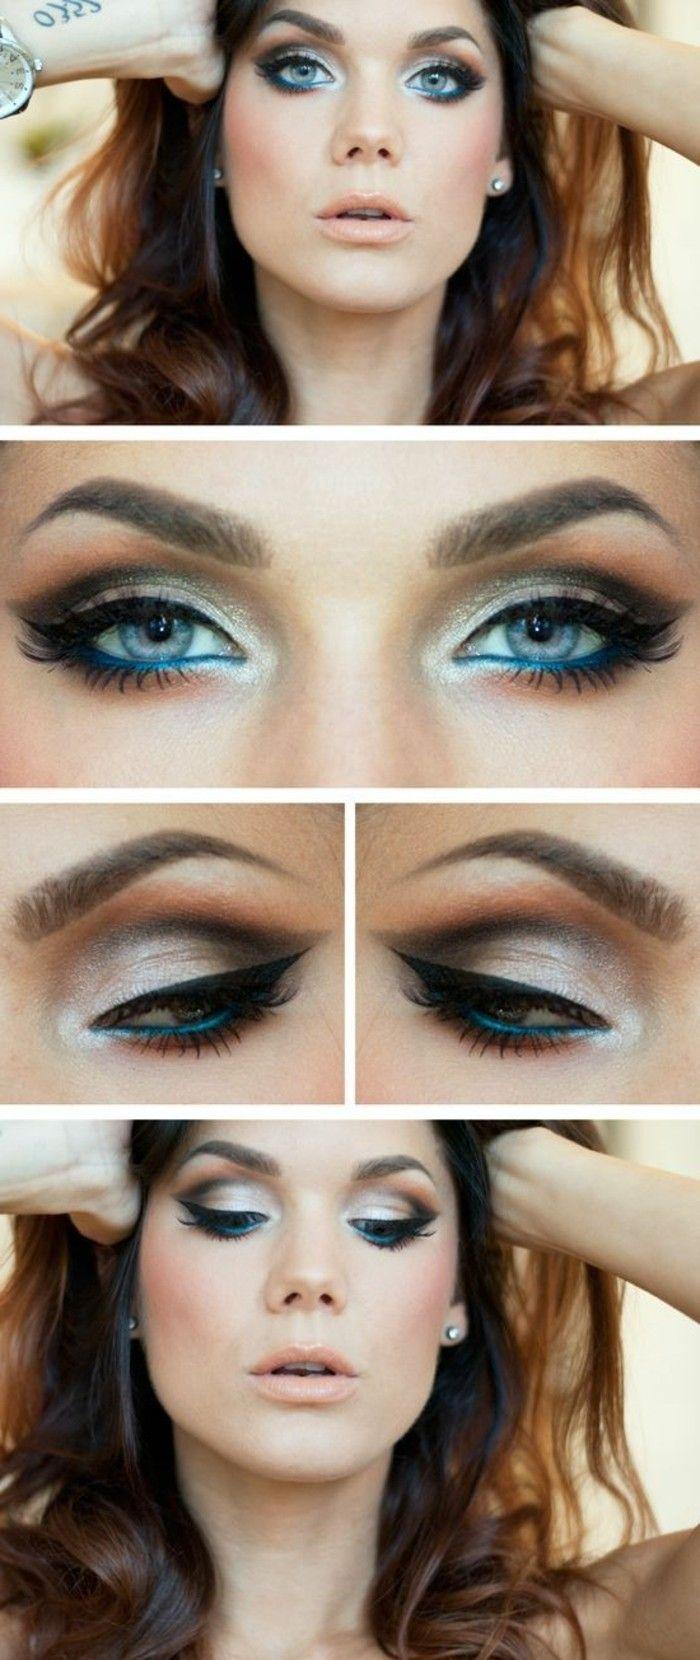 comment maquiller les yeux bleus le maquillage des stars maquillage makeup eye makeup et. Black Bedroom Furniture Sets. Home Design Ideas